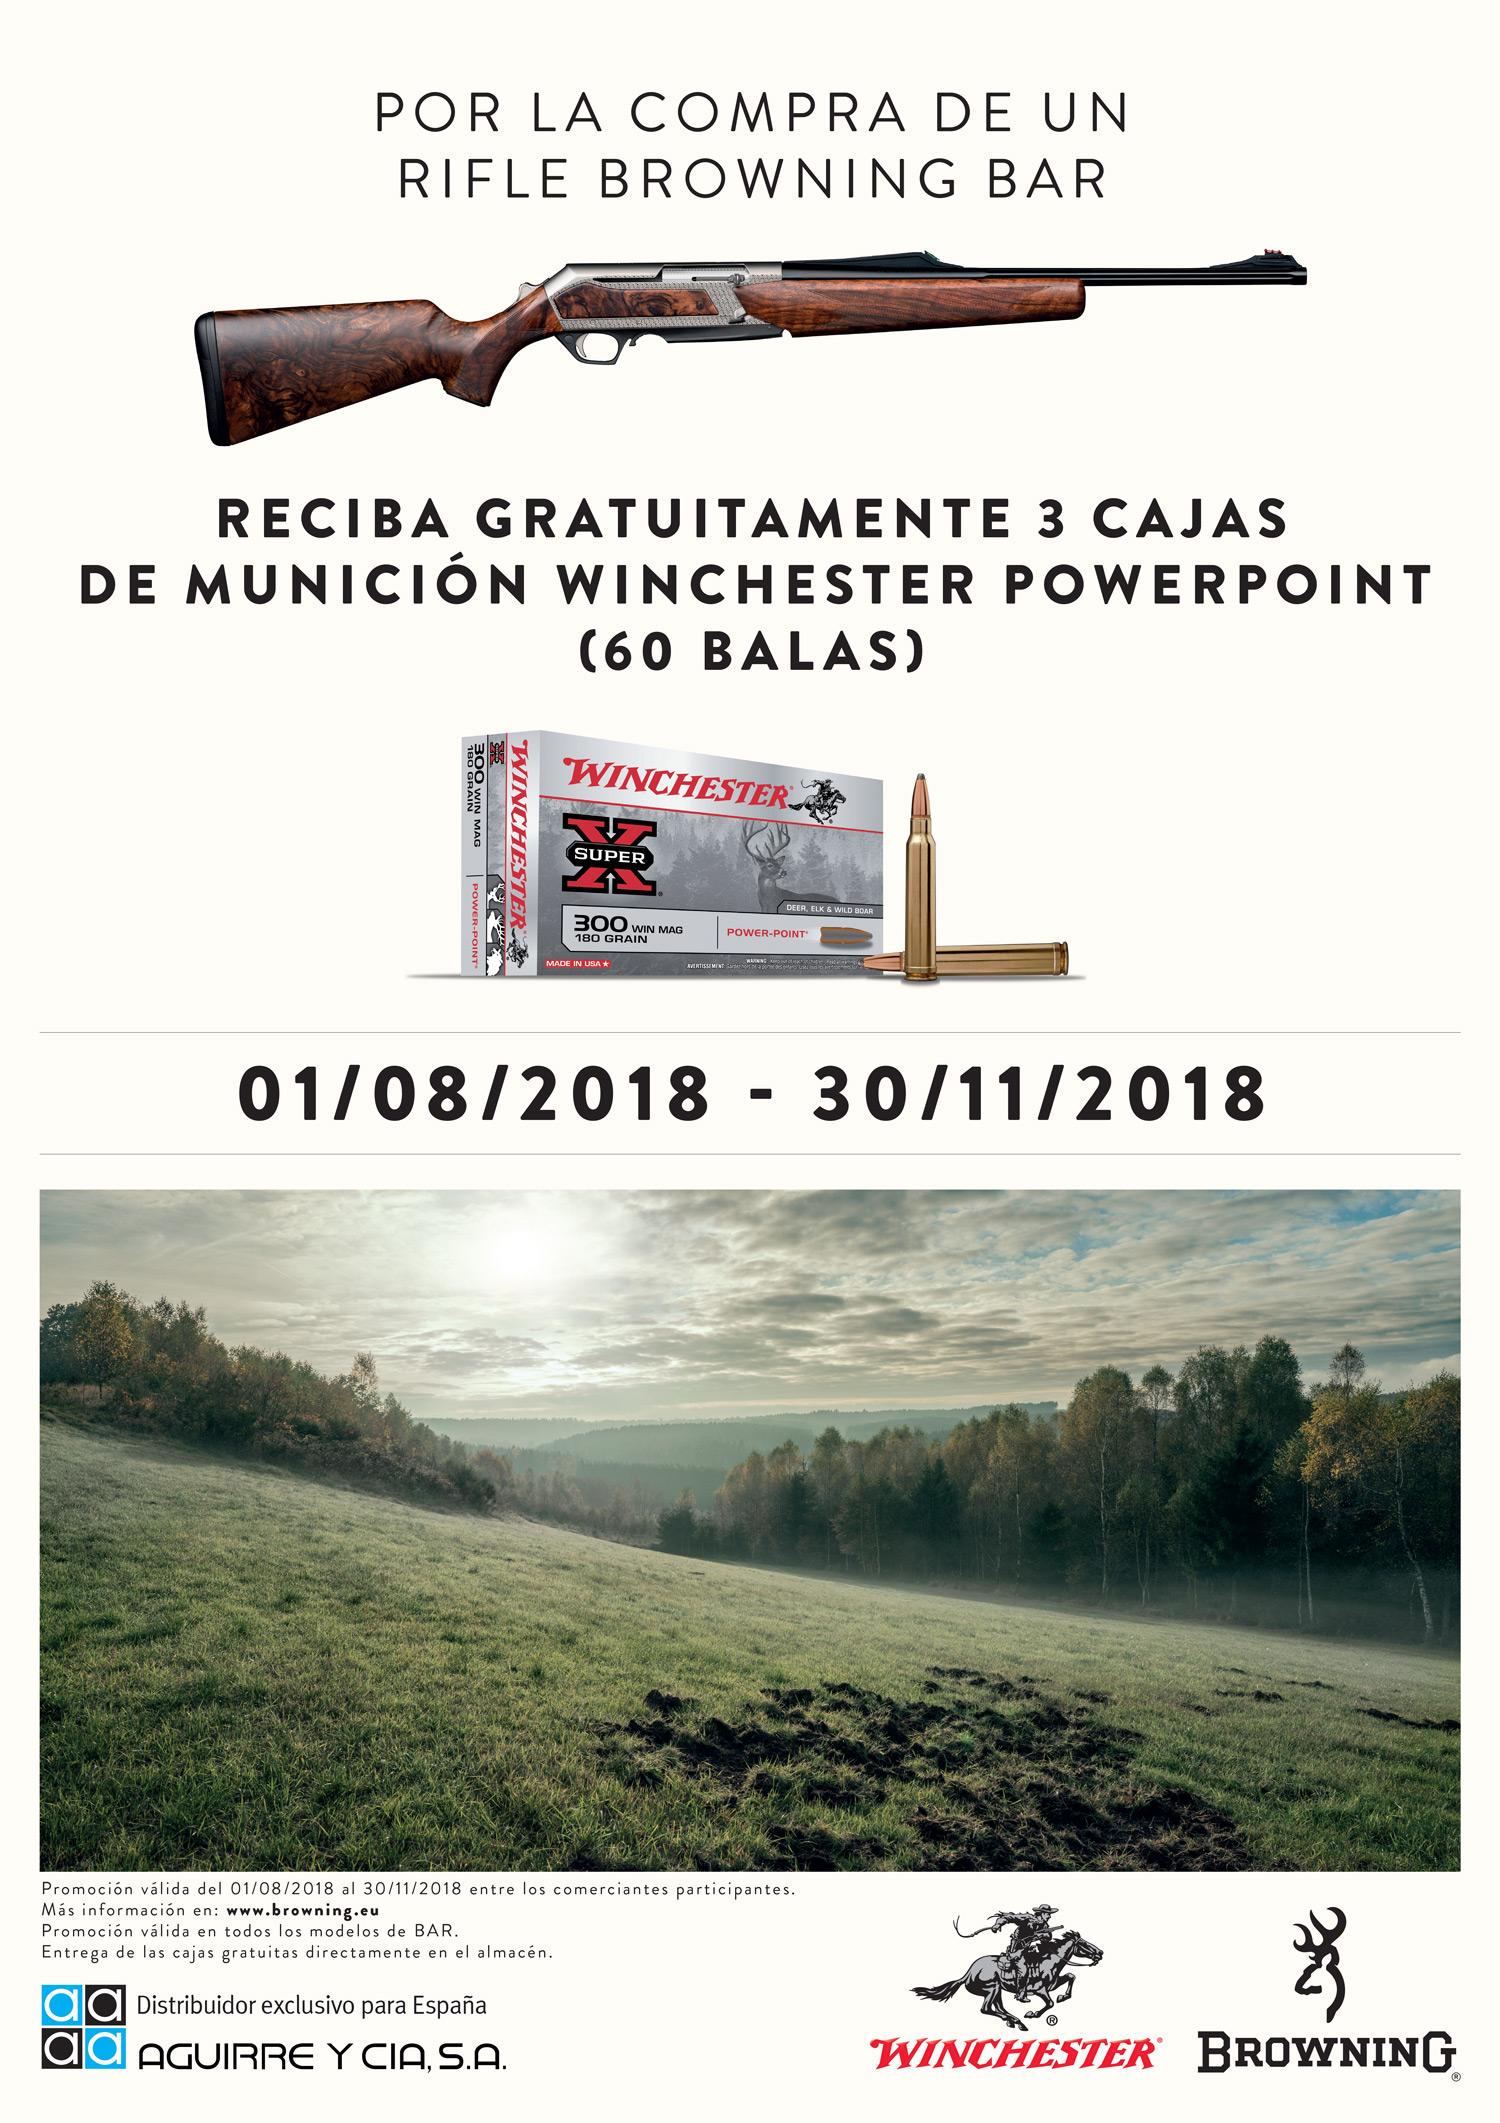 RIFLE BAR & MUNICIÓN WINCHESTER POWERPOINT